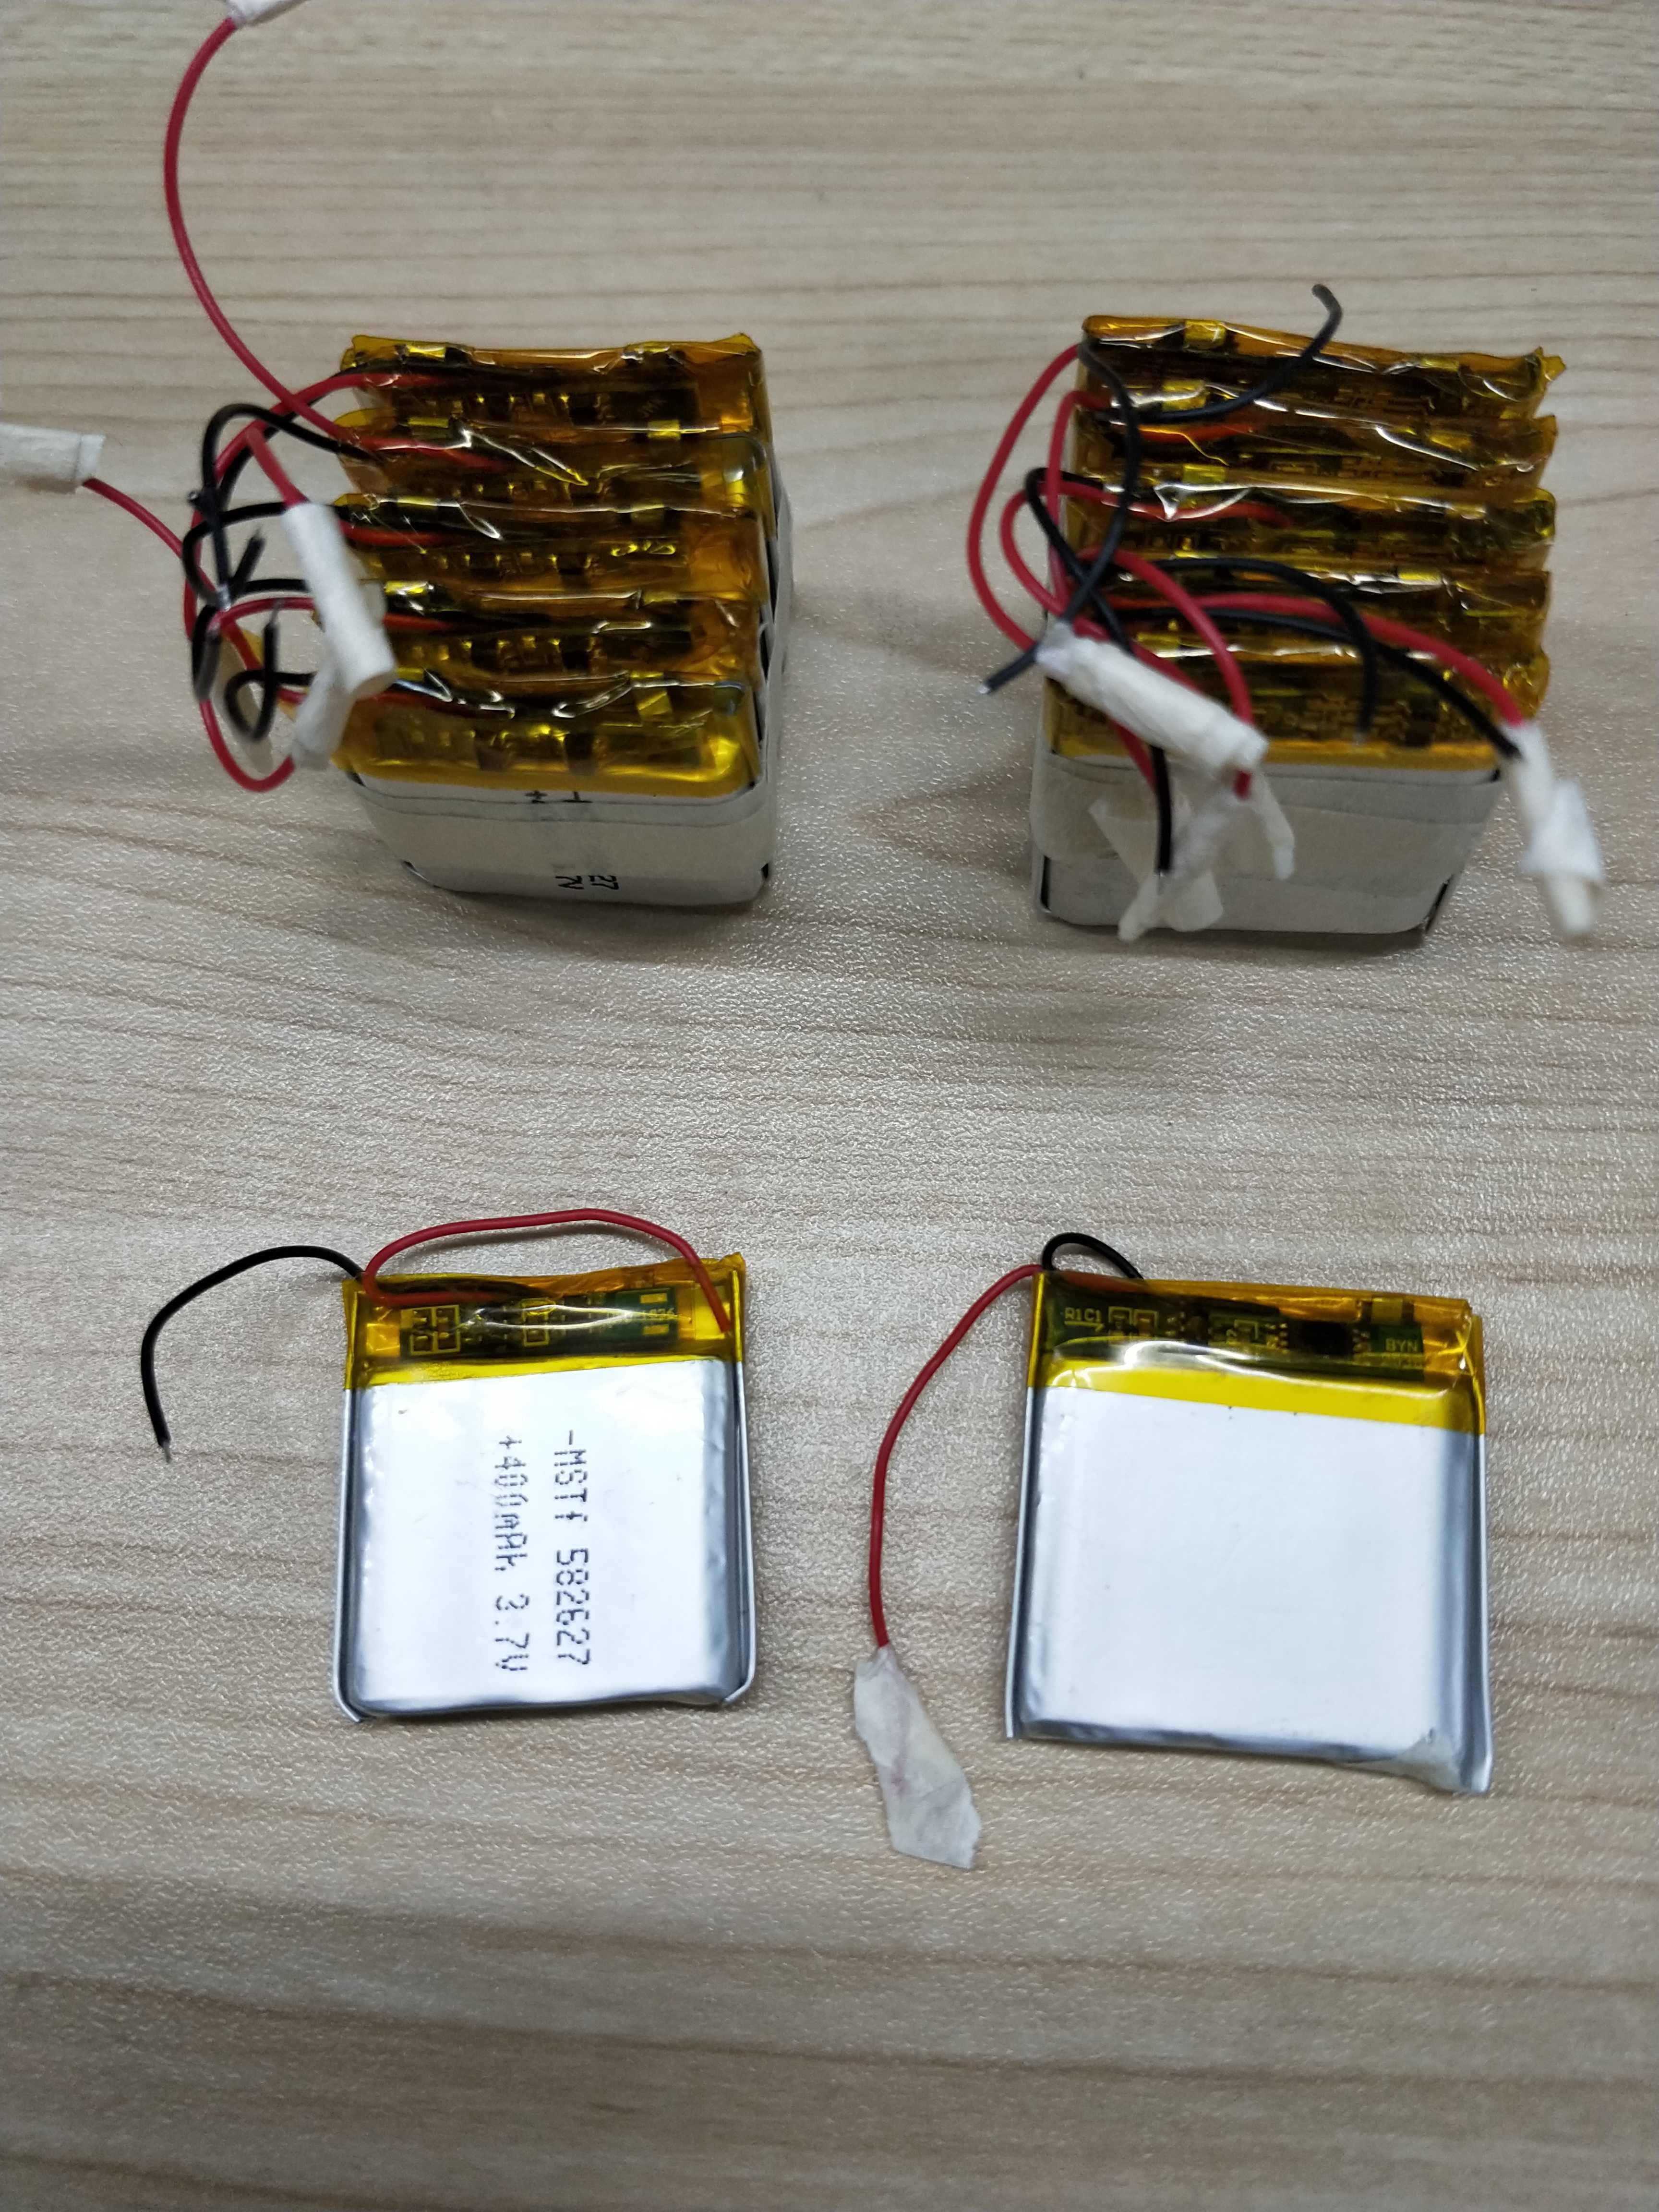 Original q50 q90 q100 gps watch Battery  or screen protect  baby smart watch q50 q90 q100 children gps watch Battery